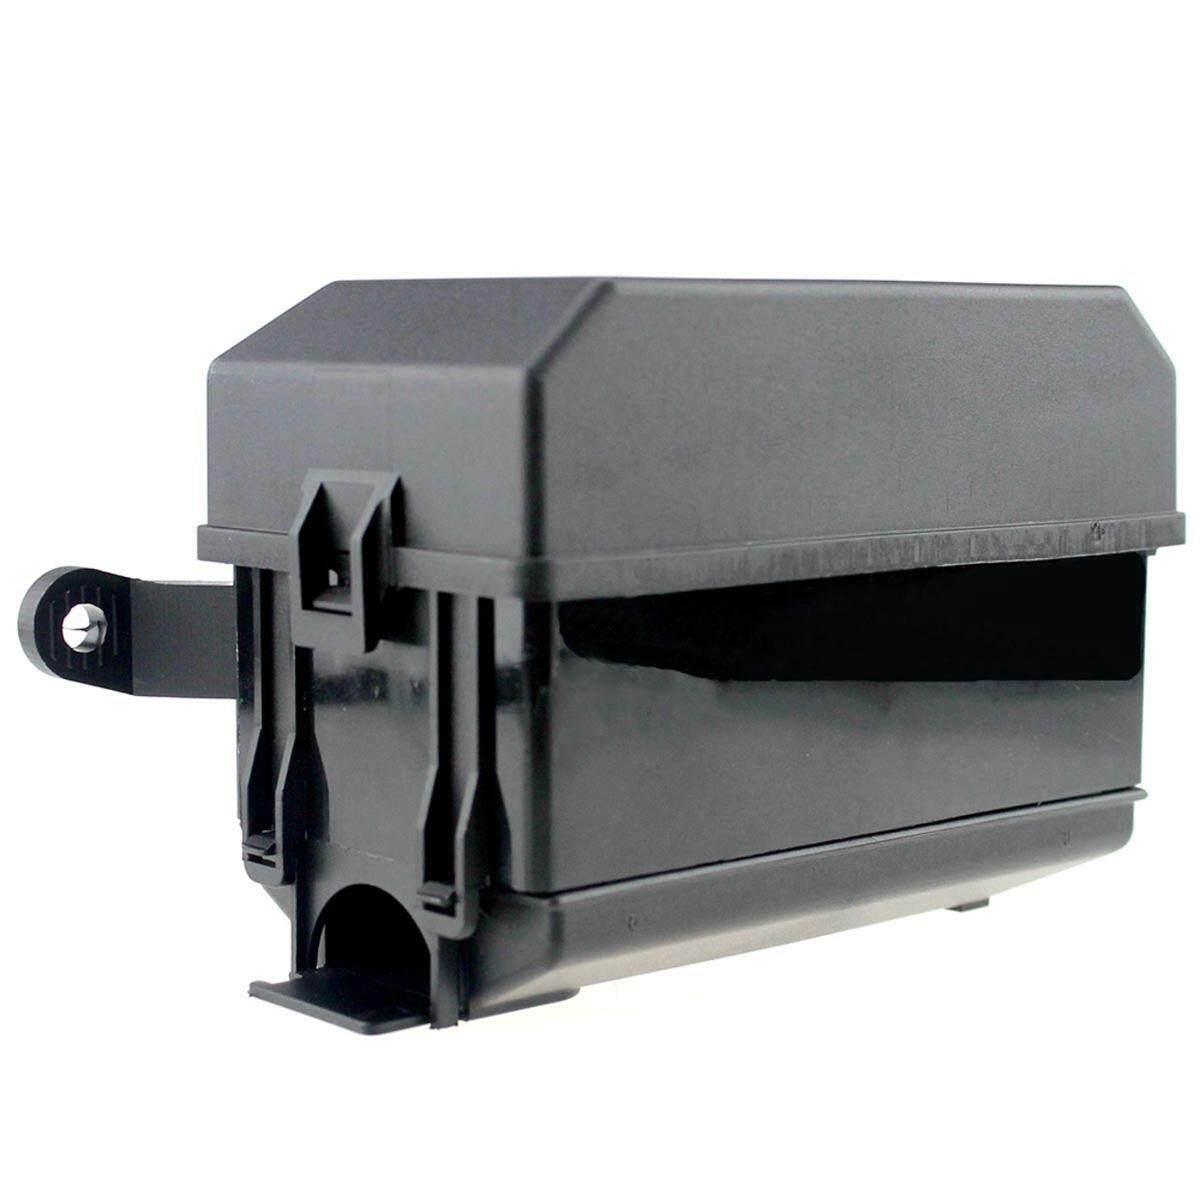 Fitur Extension Fuse Box Mini Dan Harga Terbaru Info Car Tool Iztoss F2758 Portable 6 Way Relay Black